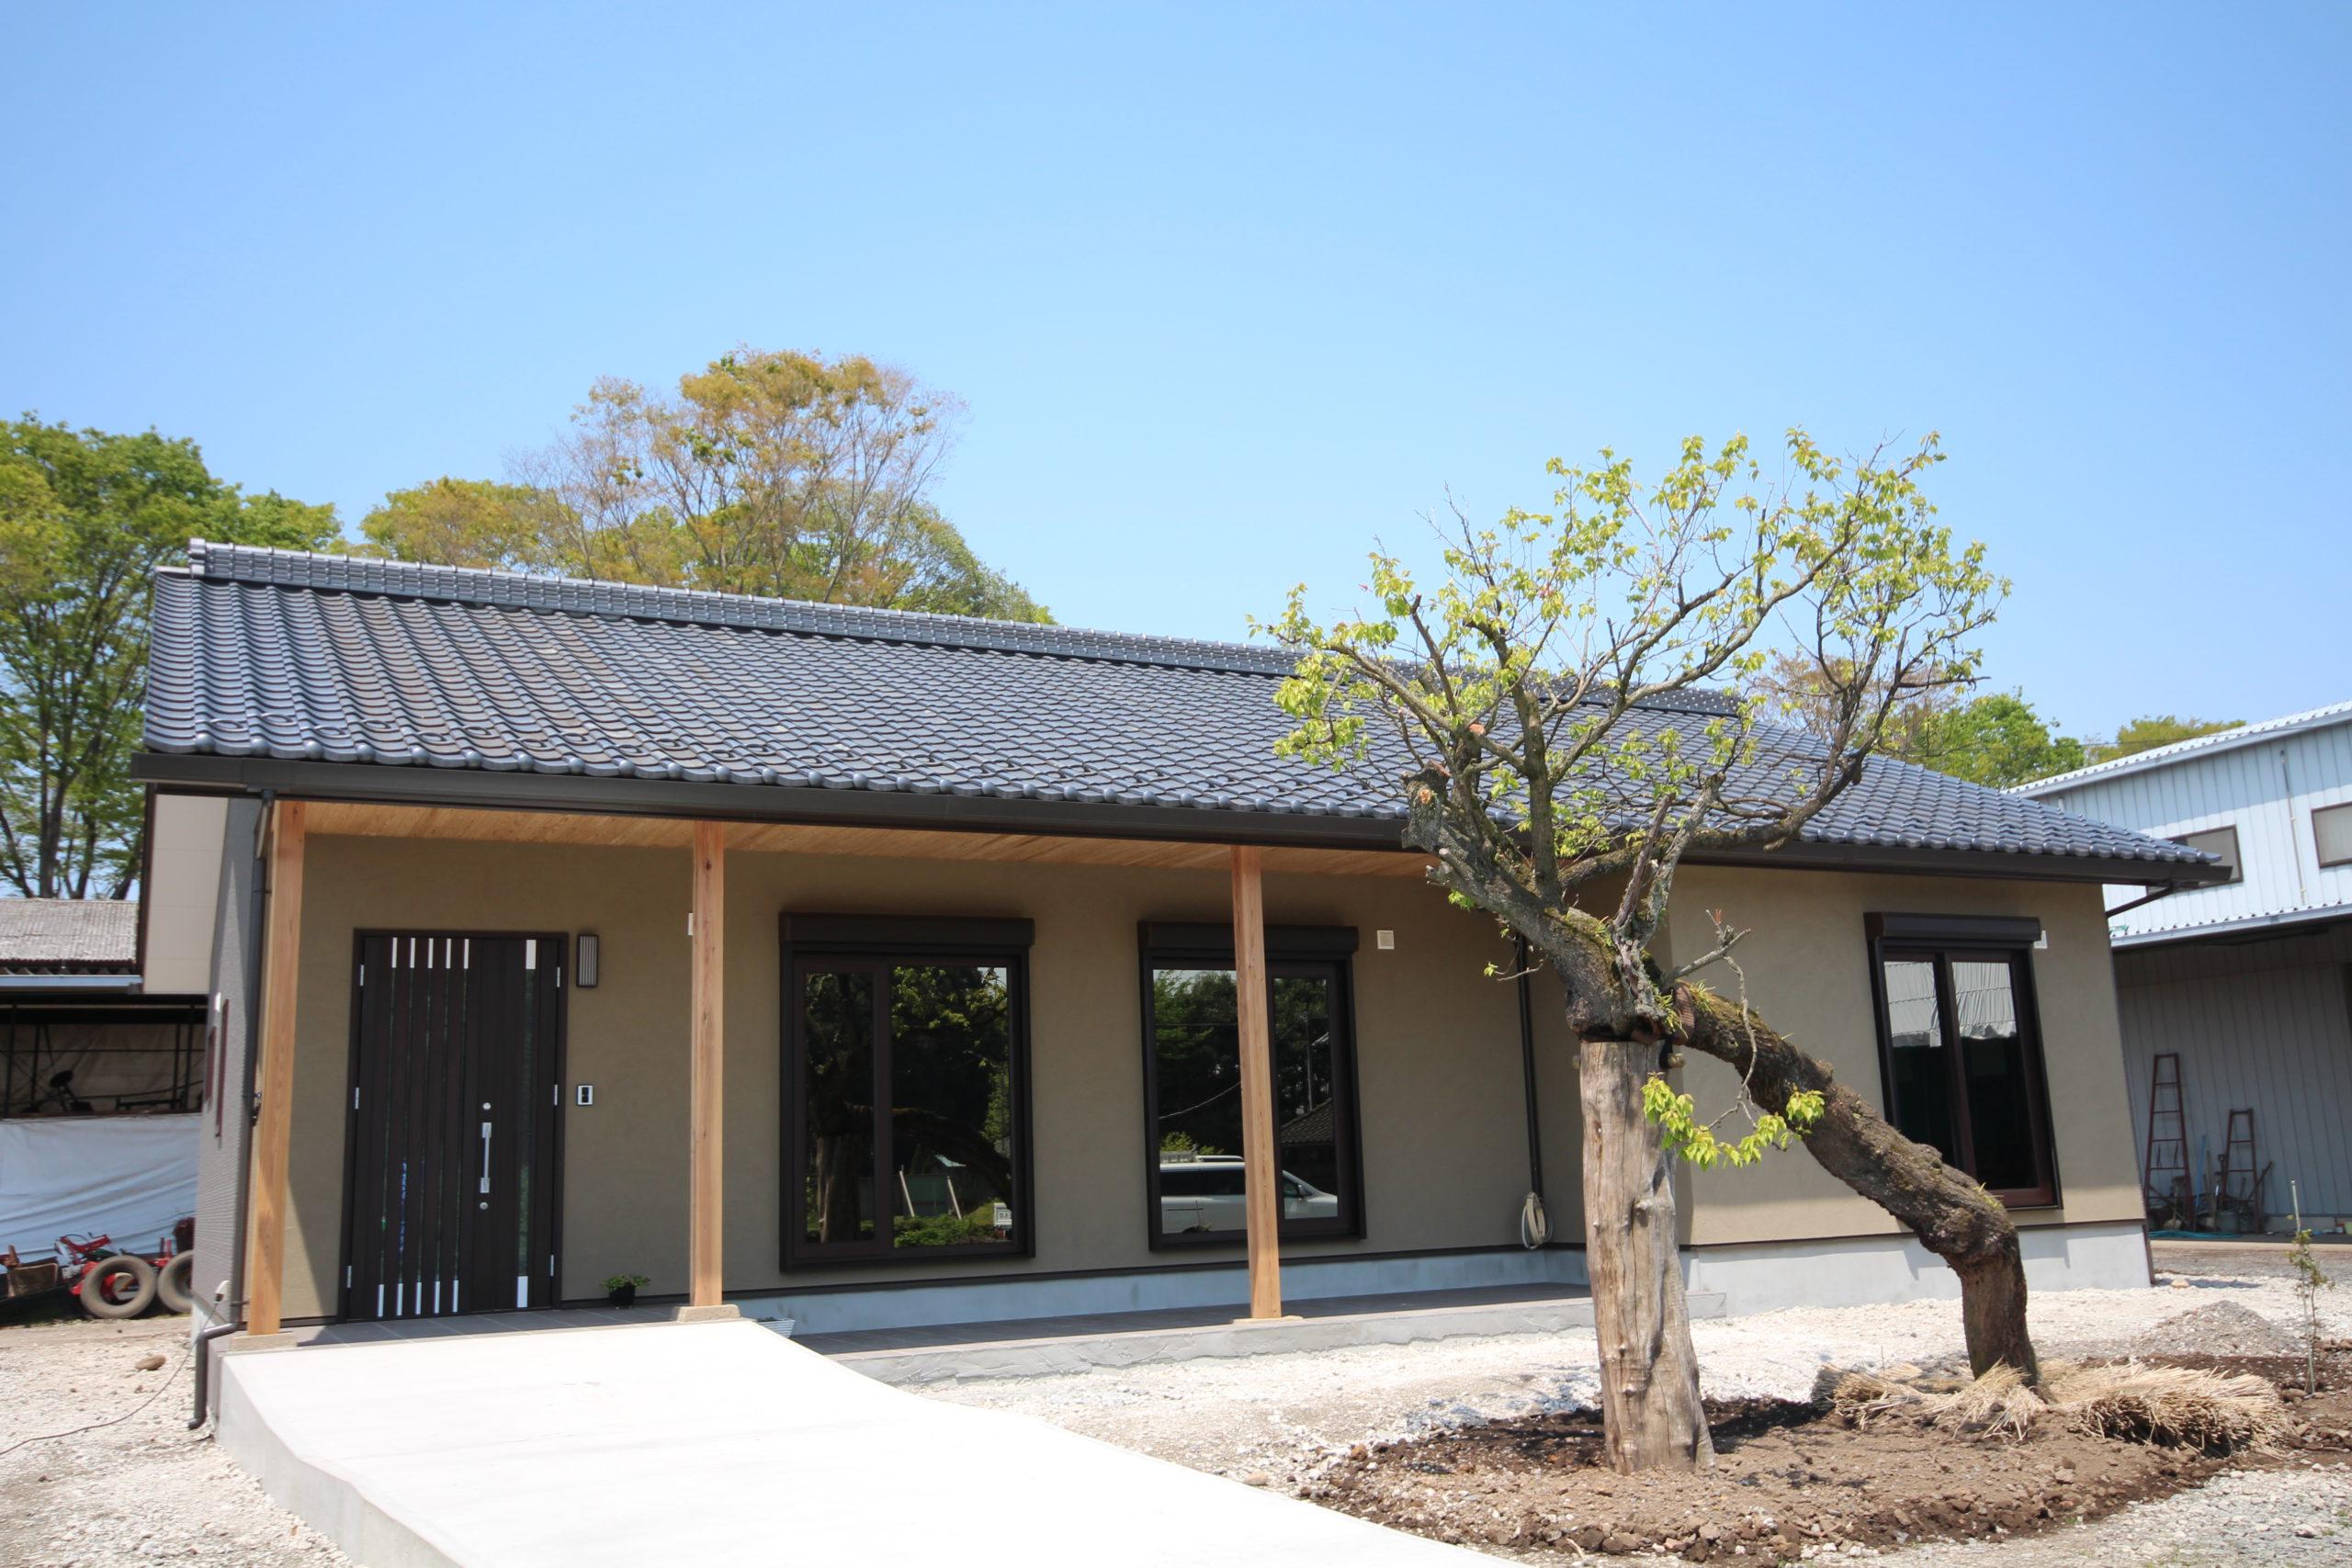 栃木県上三川の耐震住宅施工事例M邸の外観